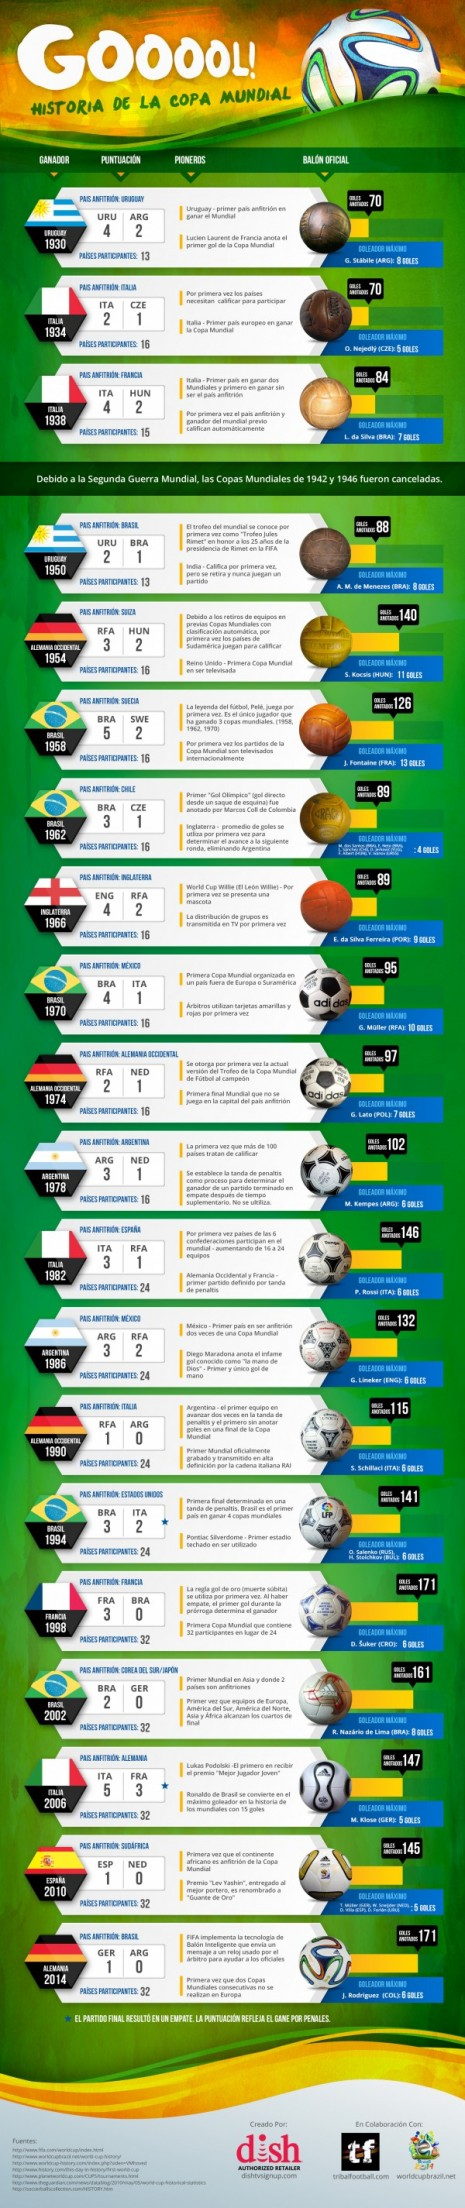 grafico-copa-mundial